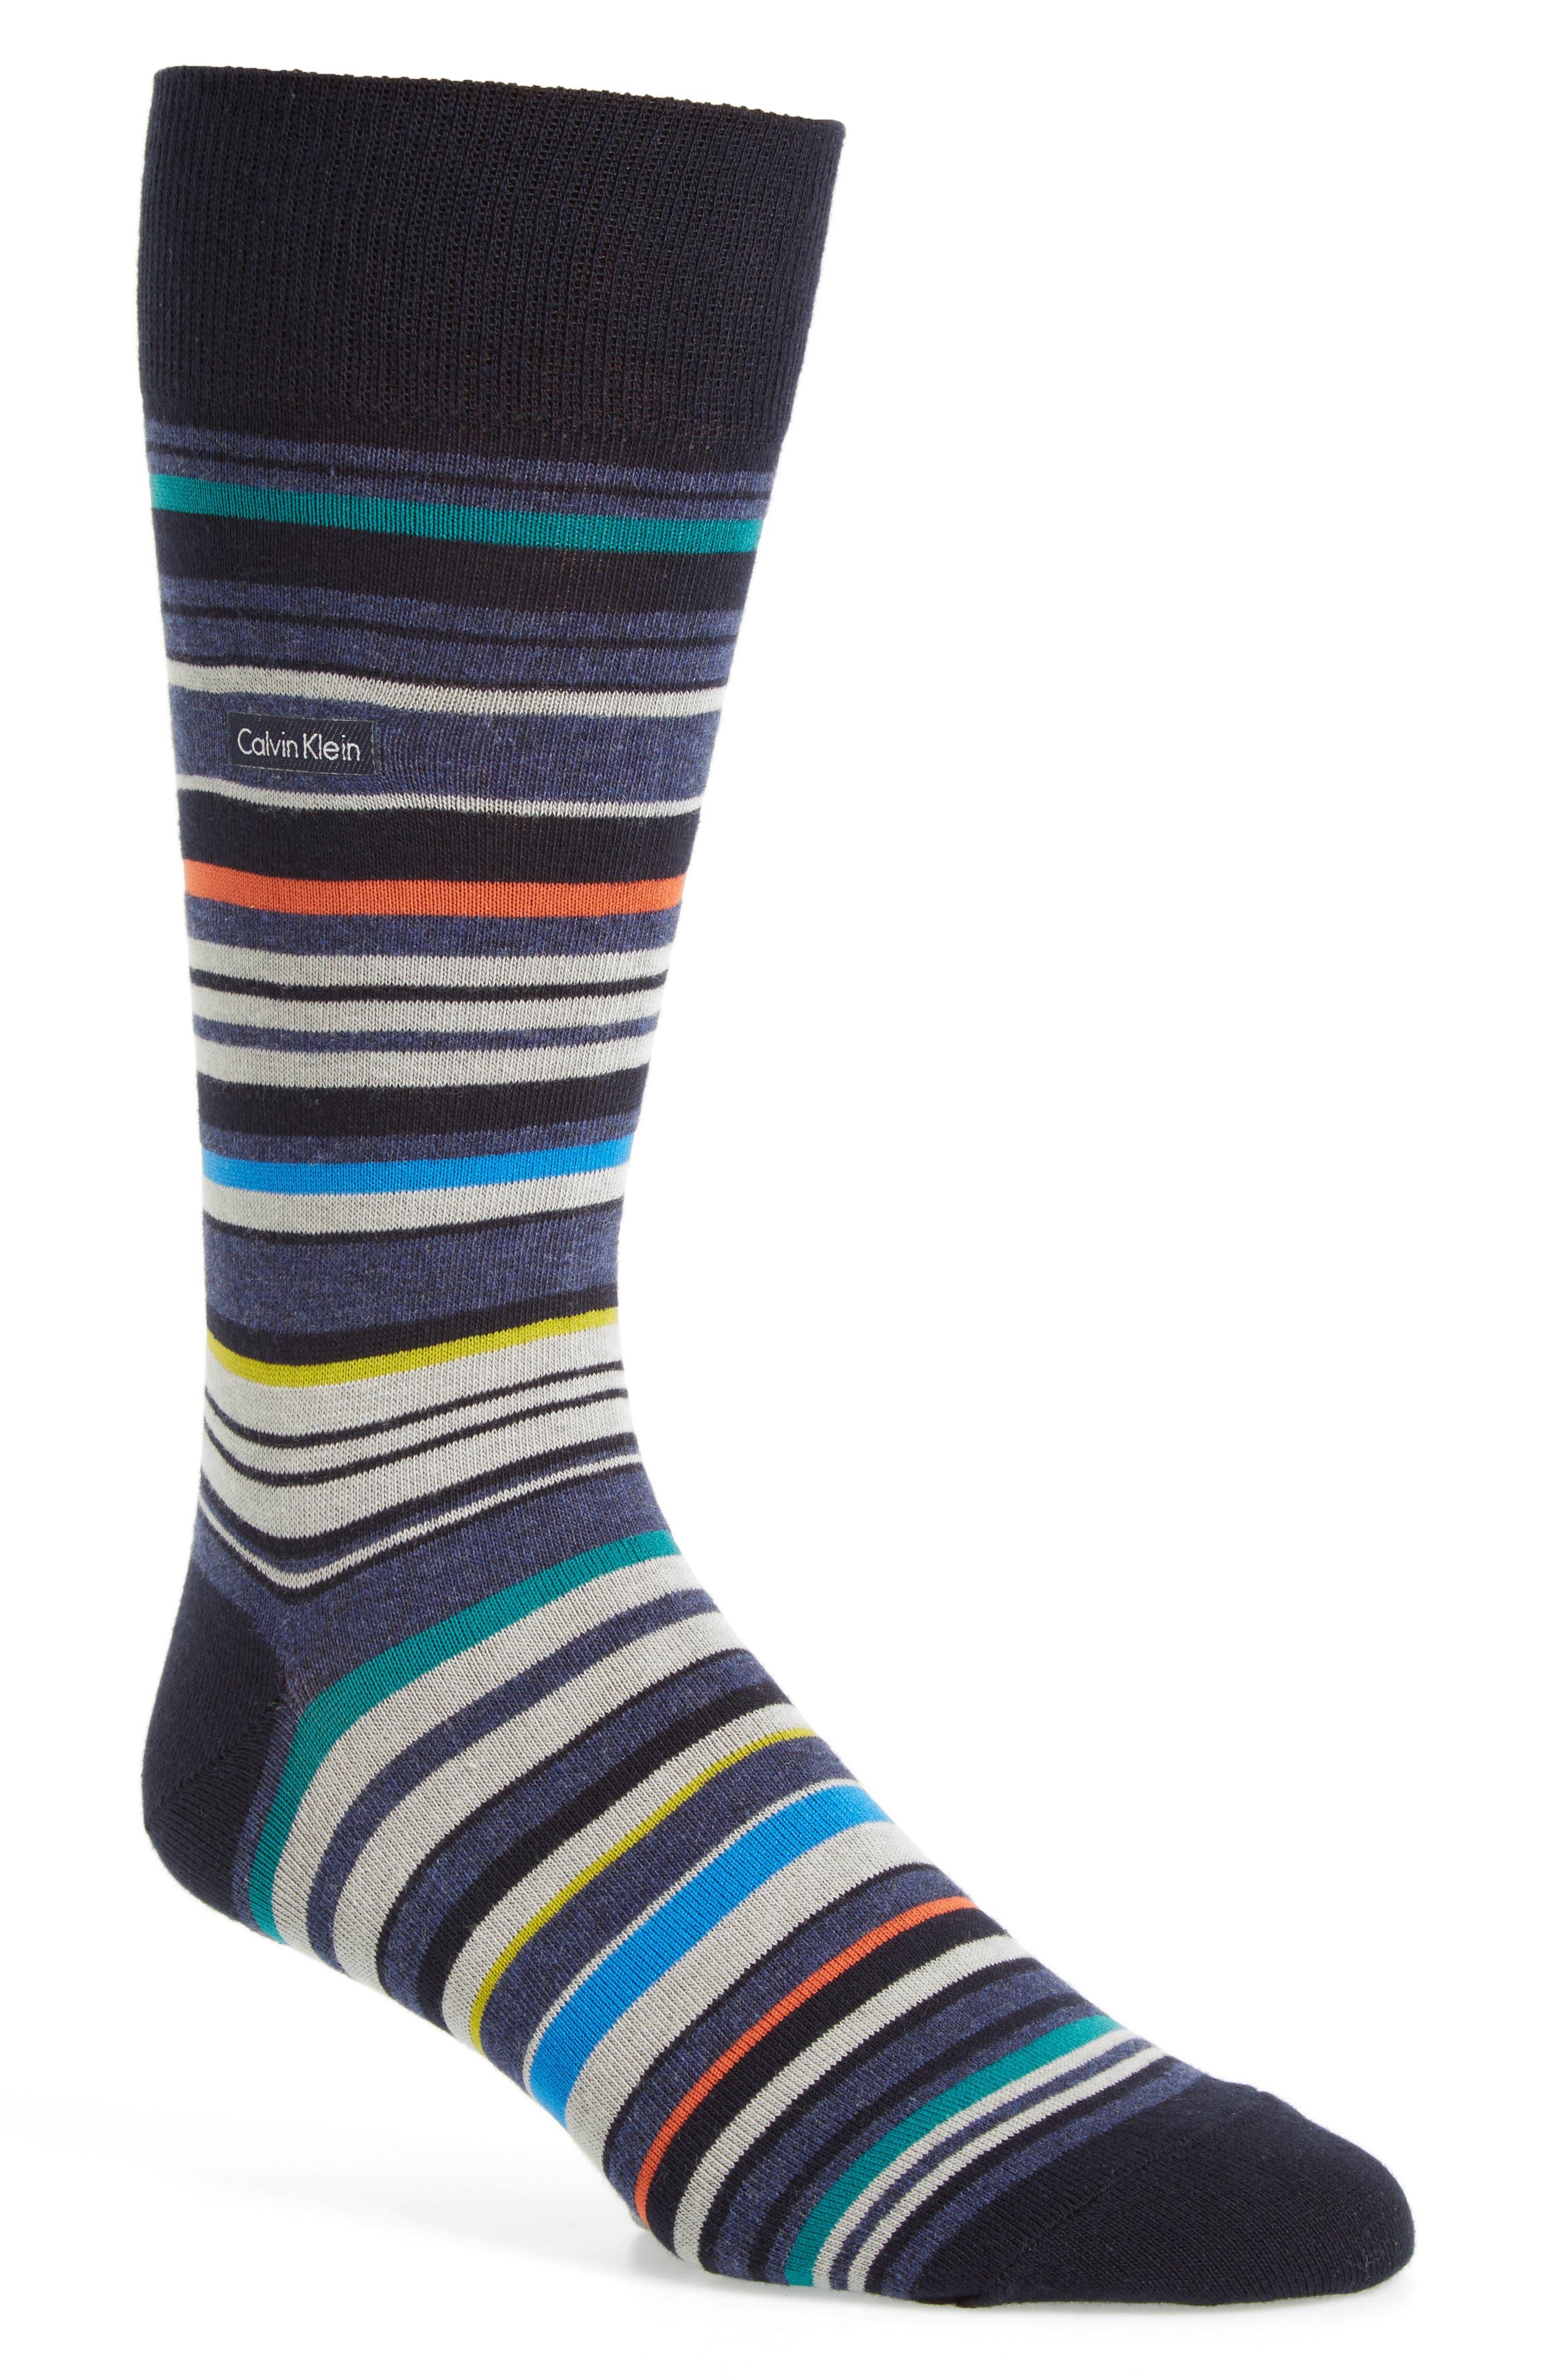 Alternate Image 1 Selected - Calvin Klein Multistripe Emblem Socks